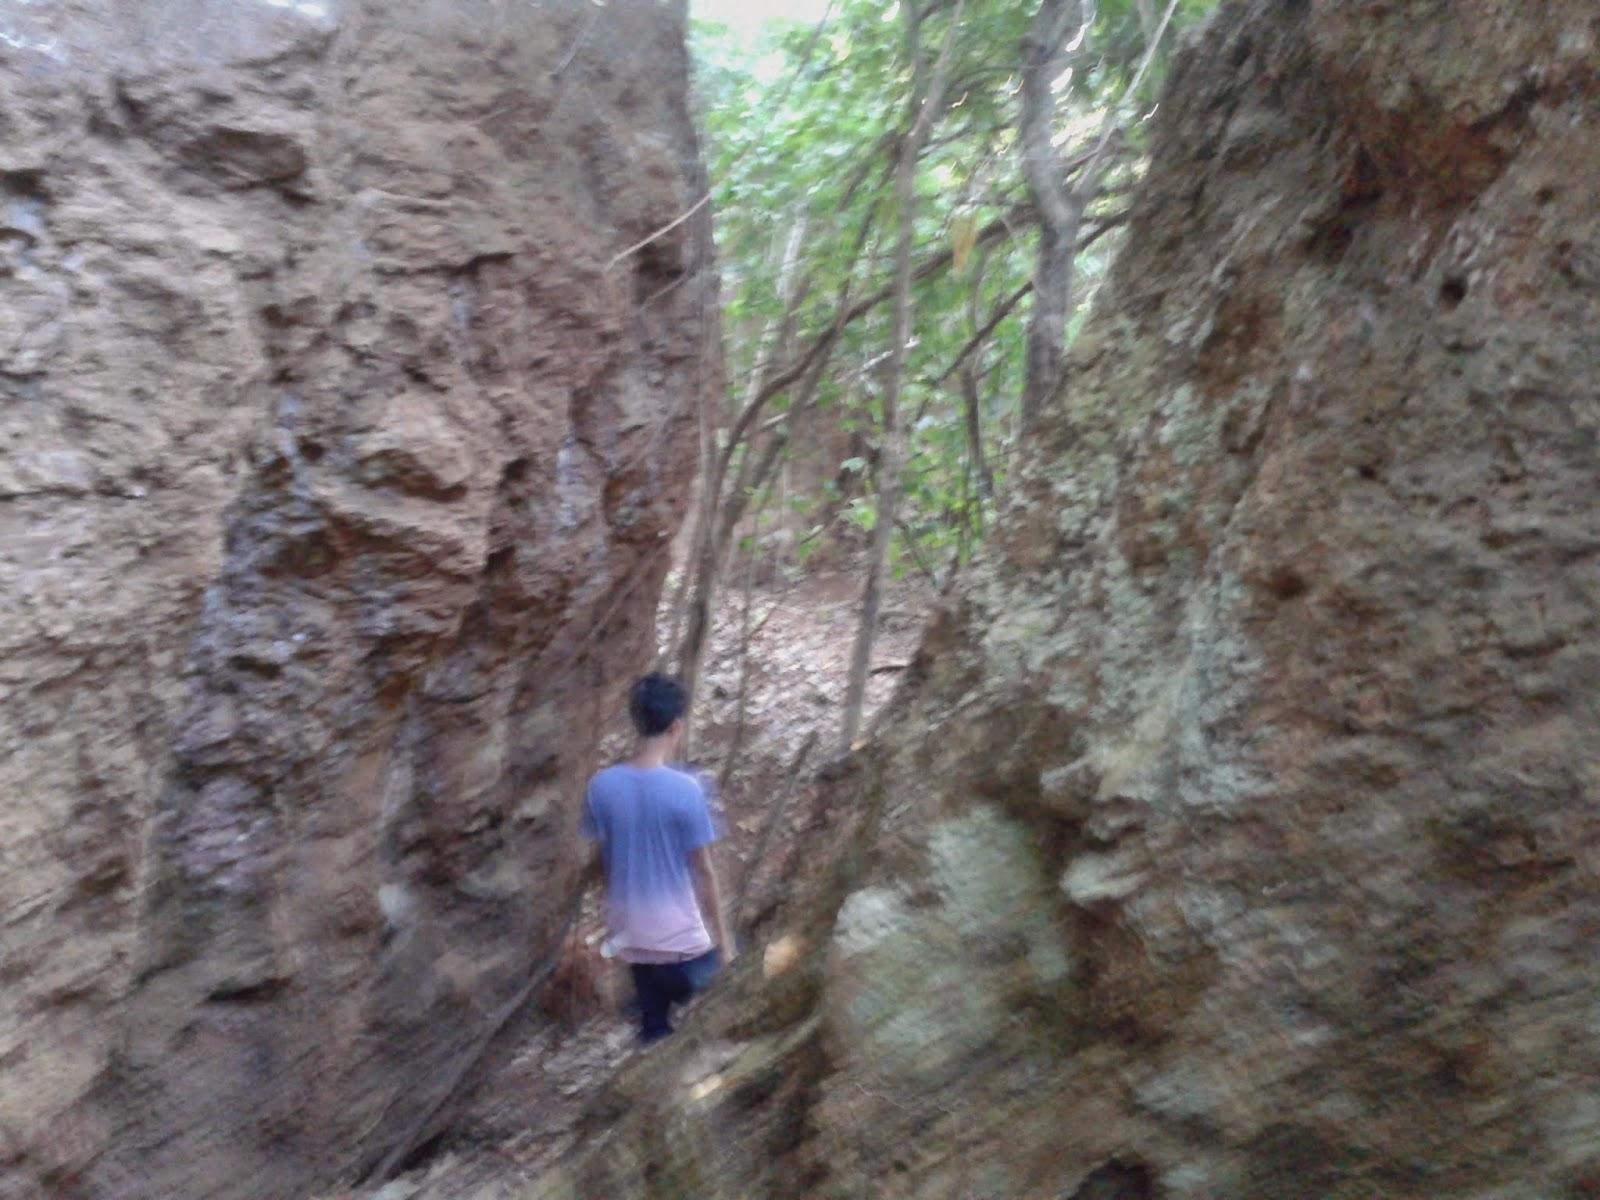 Jalan setapak diantara bongkahan batu